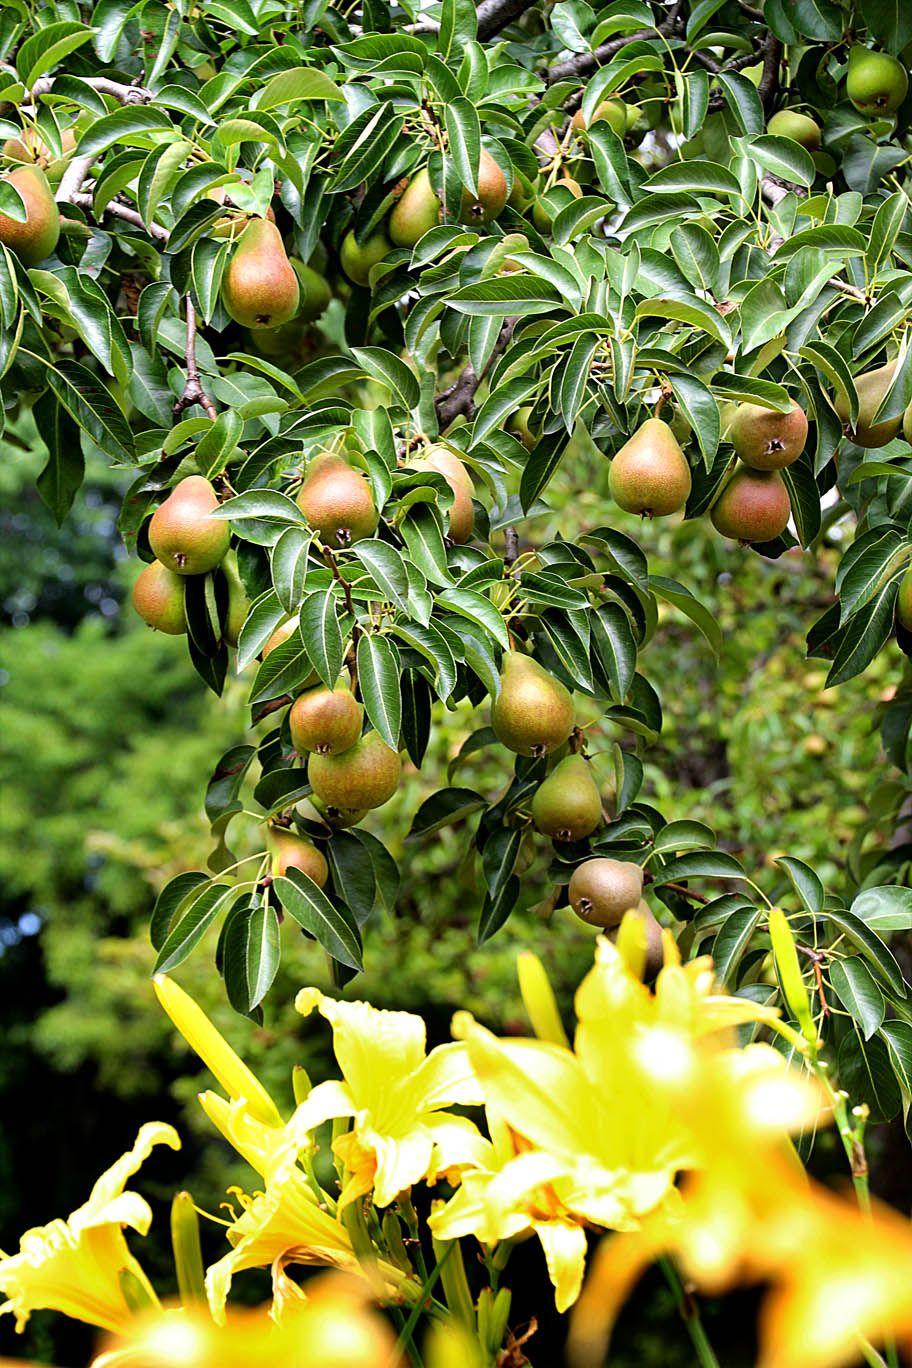 Pears at The Manor #fruittress #themanor #themanorgarden #flowers #beautiful #trees #fruit #WestOrangeNJ #pears